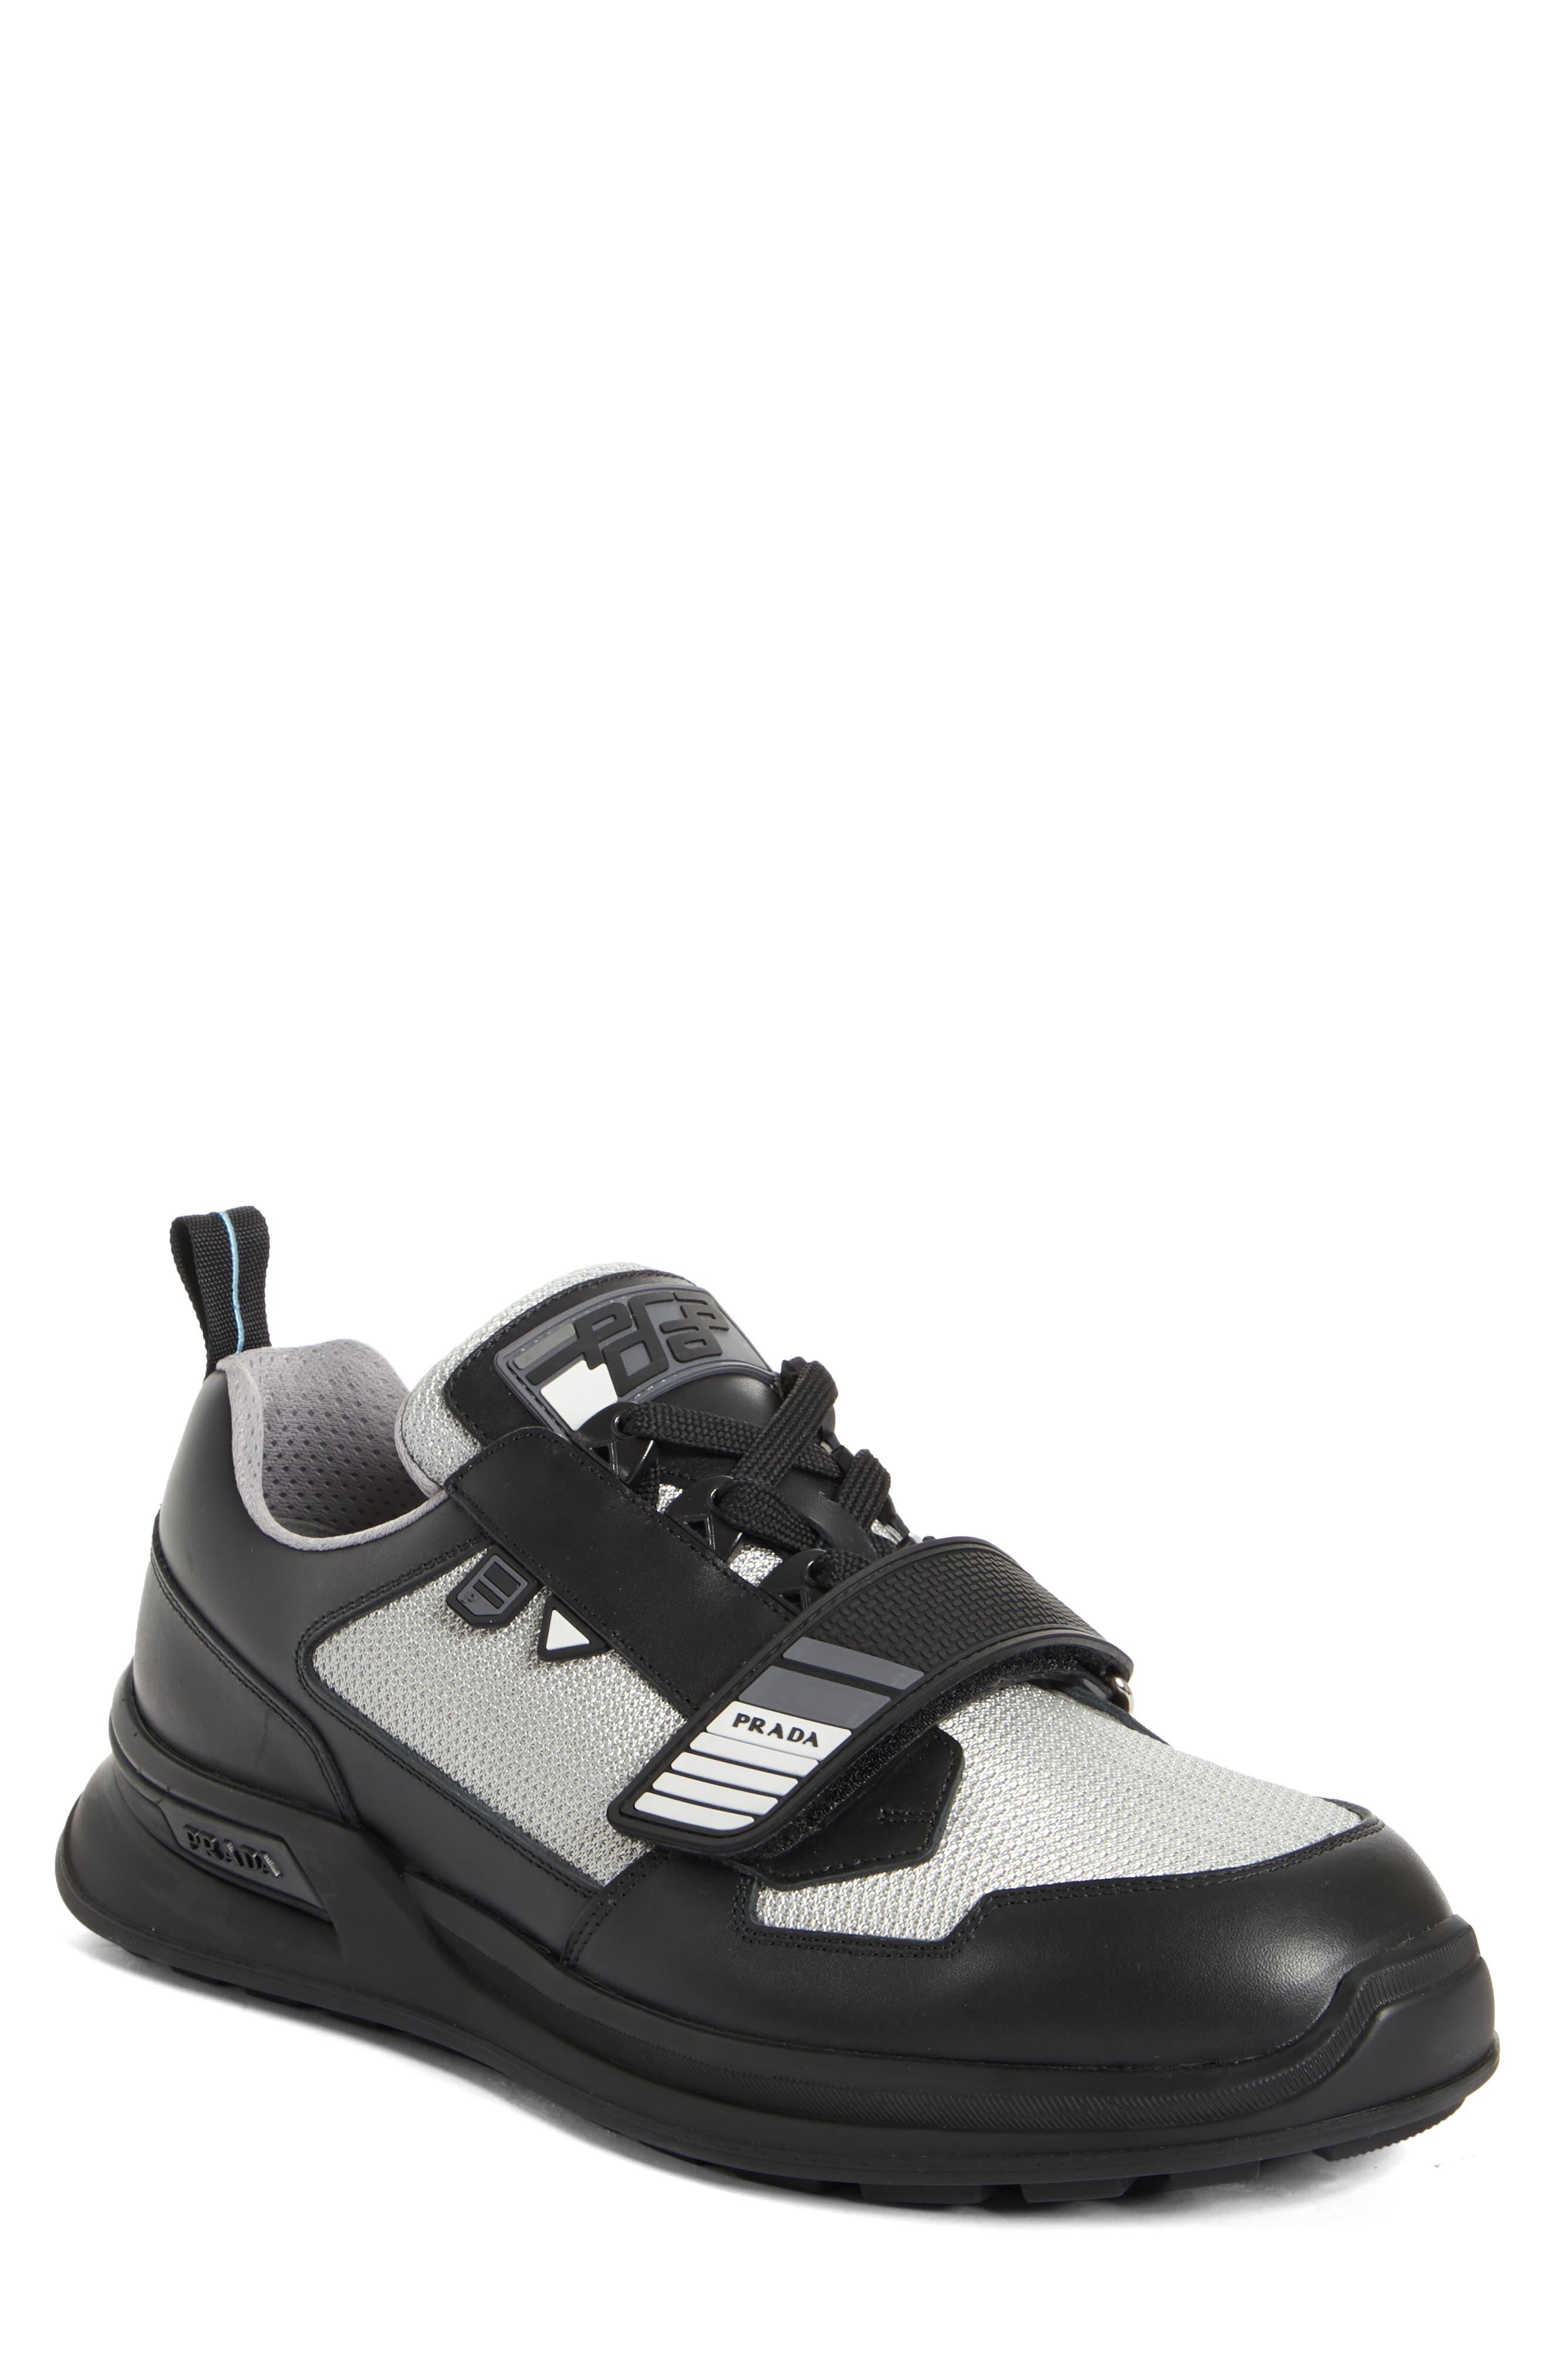 d24465d5a0dbc Men s Prada Shoes